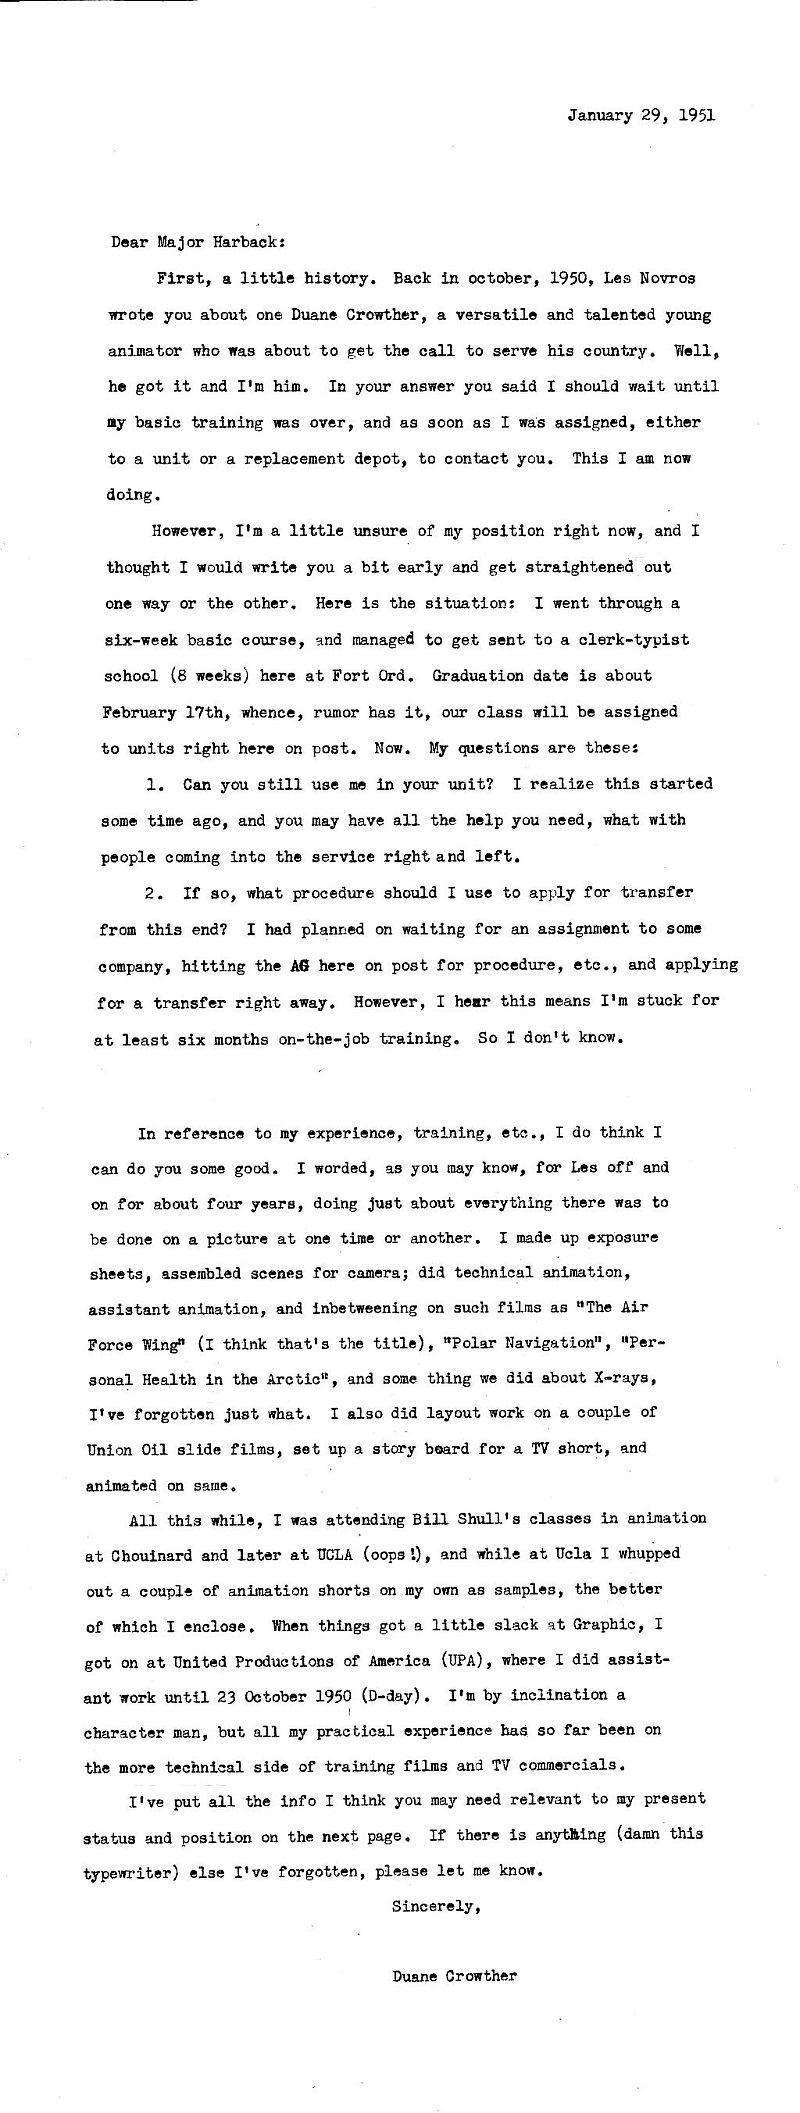 duane-letter-1-29-51-comp.jpg